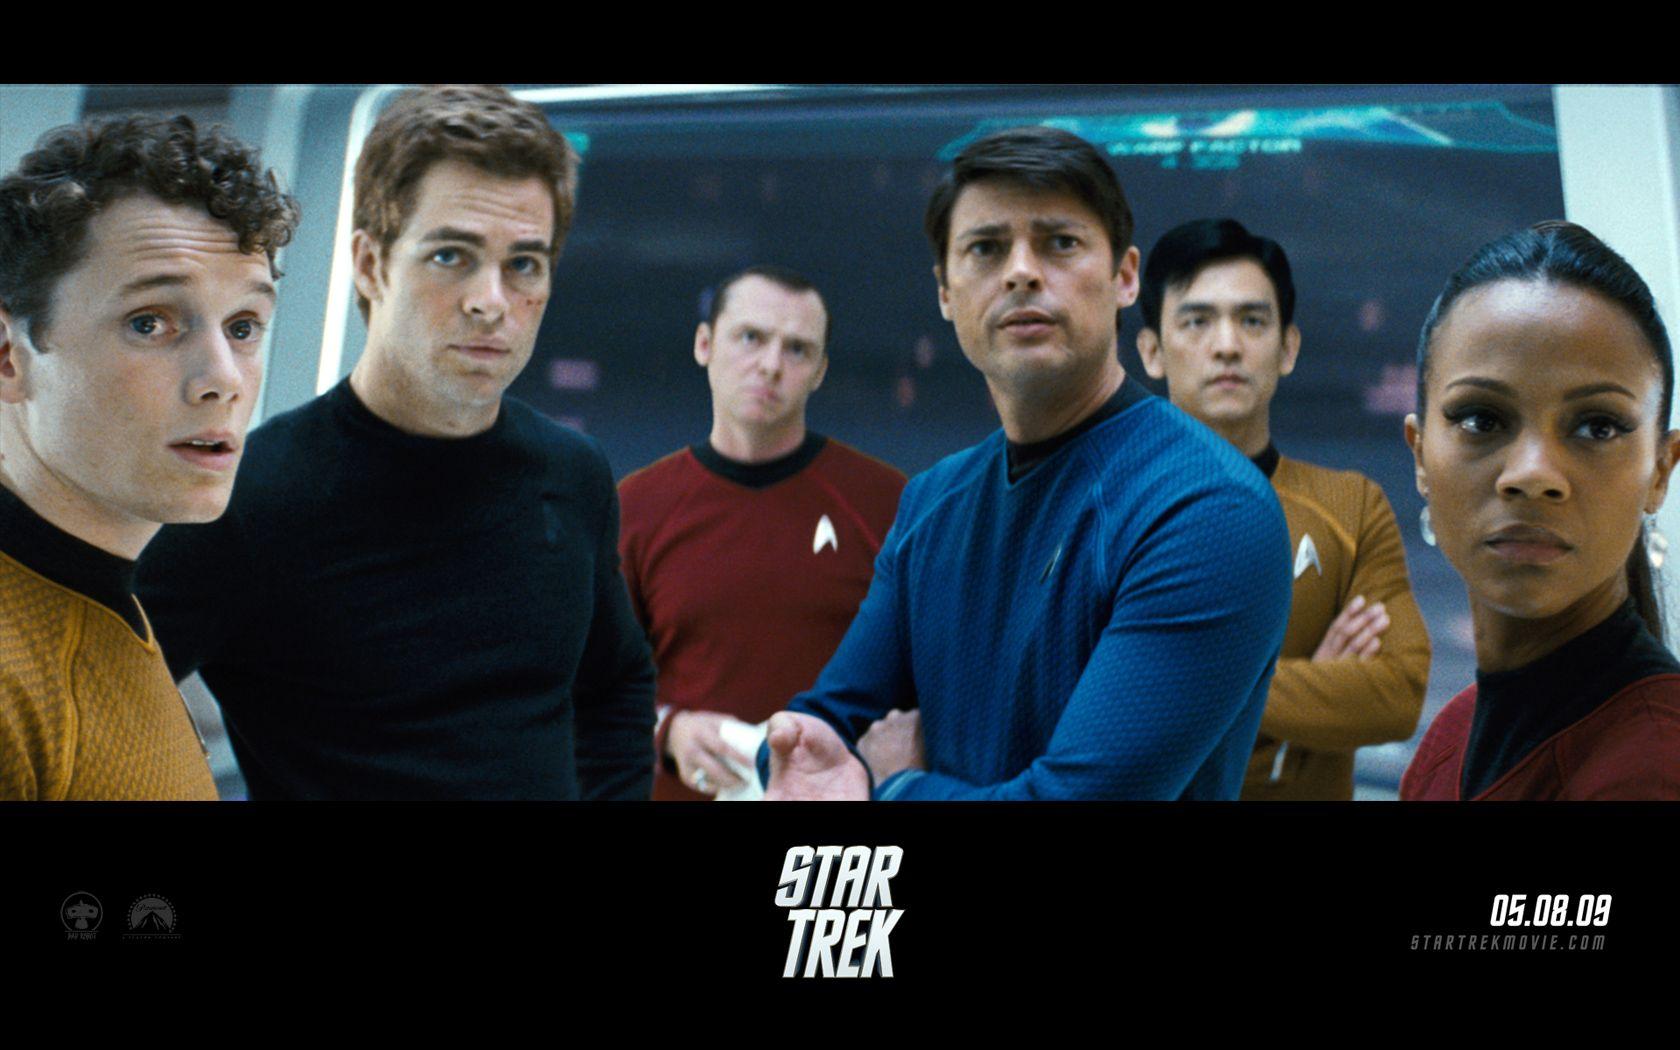 Star Trek 2009 Cast Poster Wallpaper 1680x1050